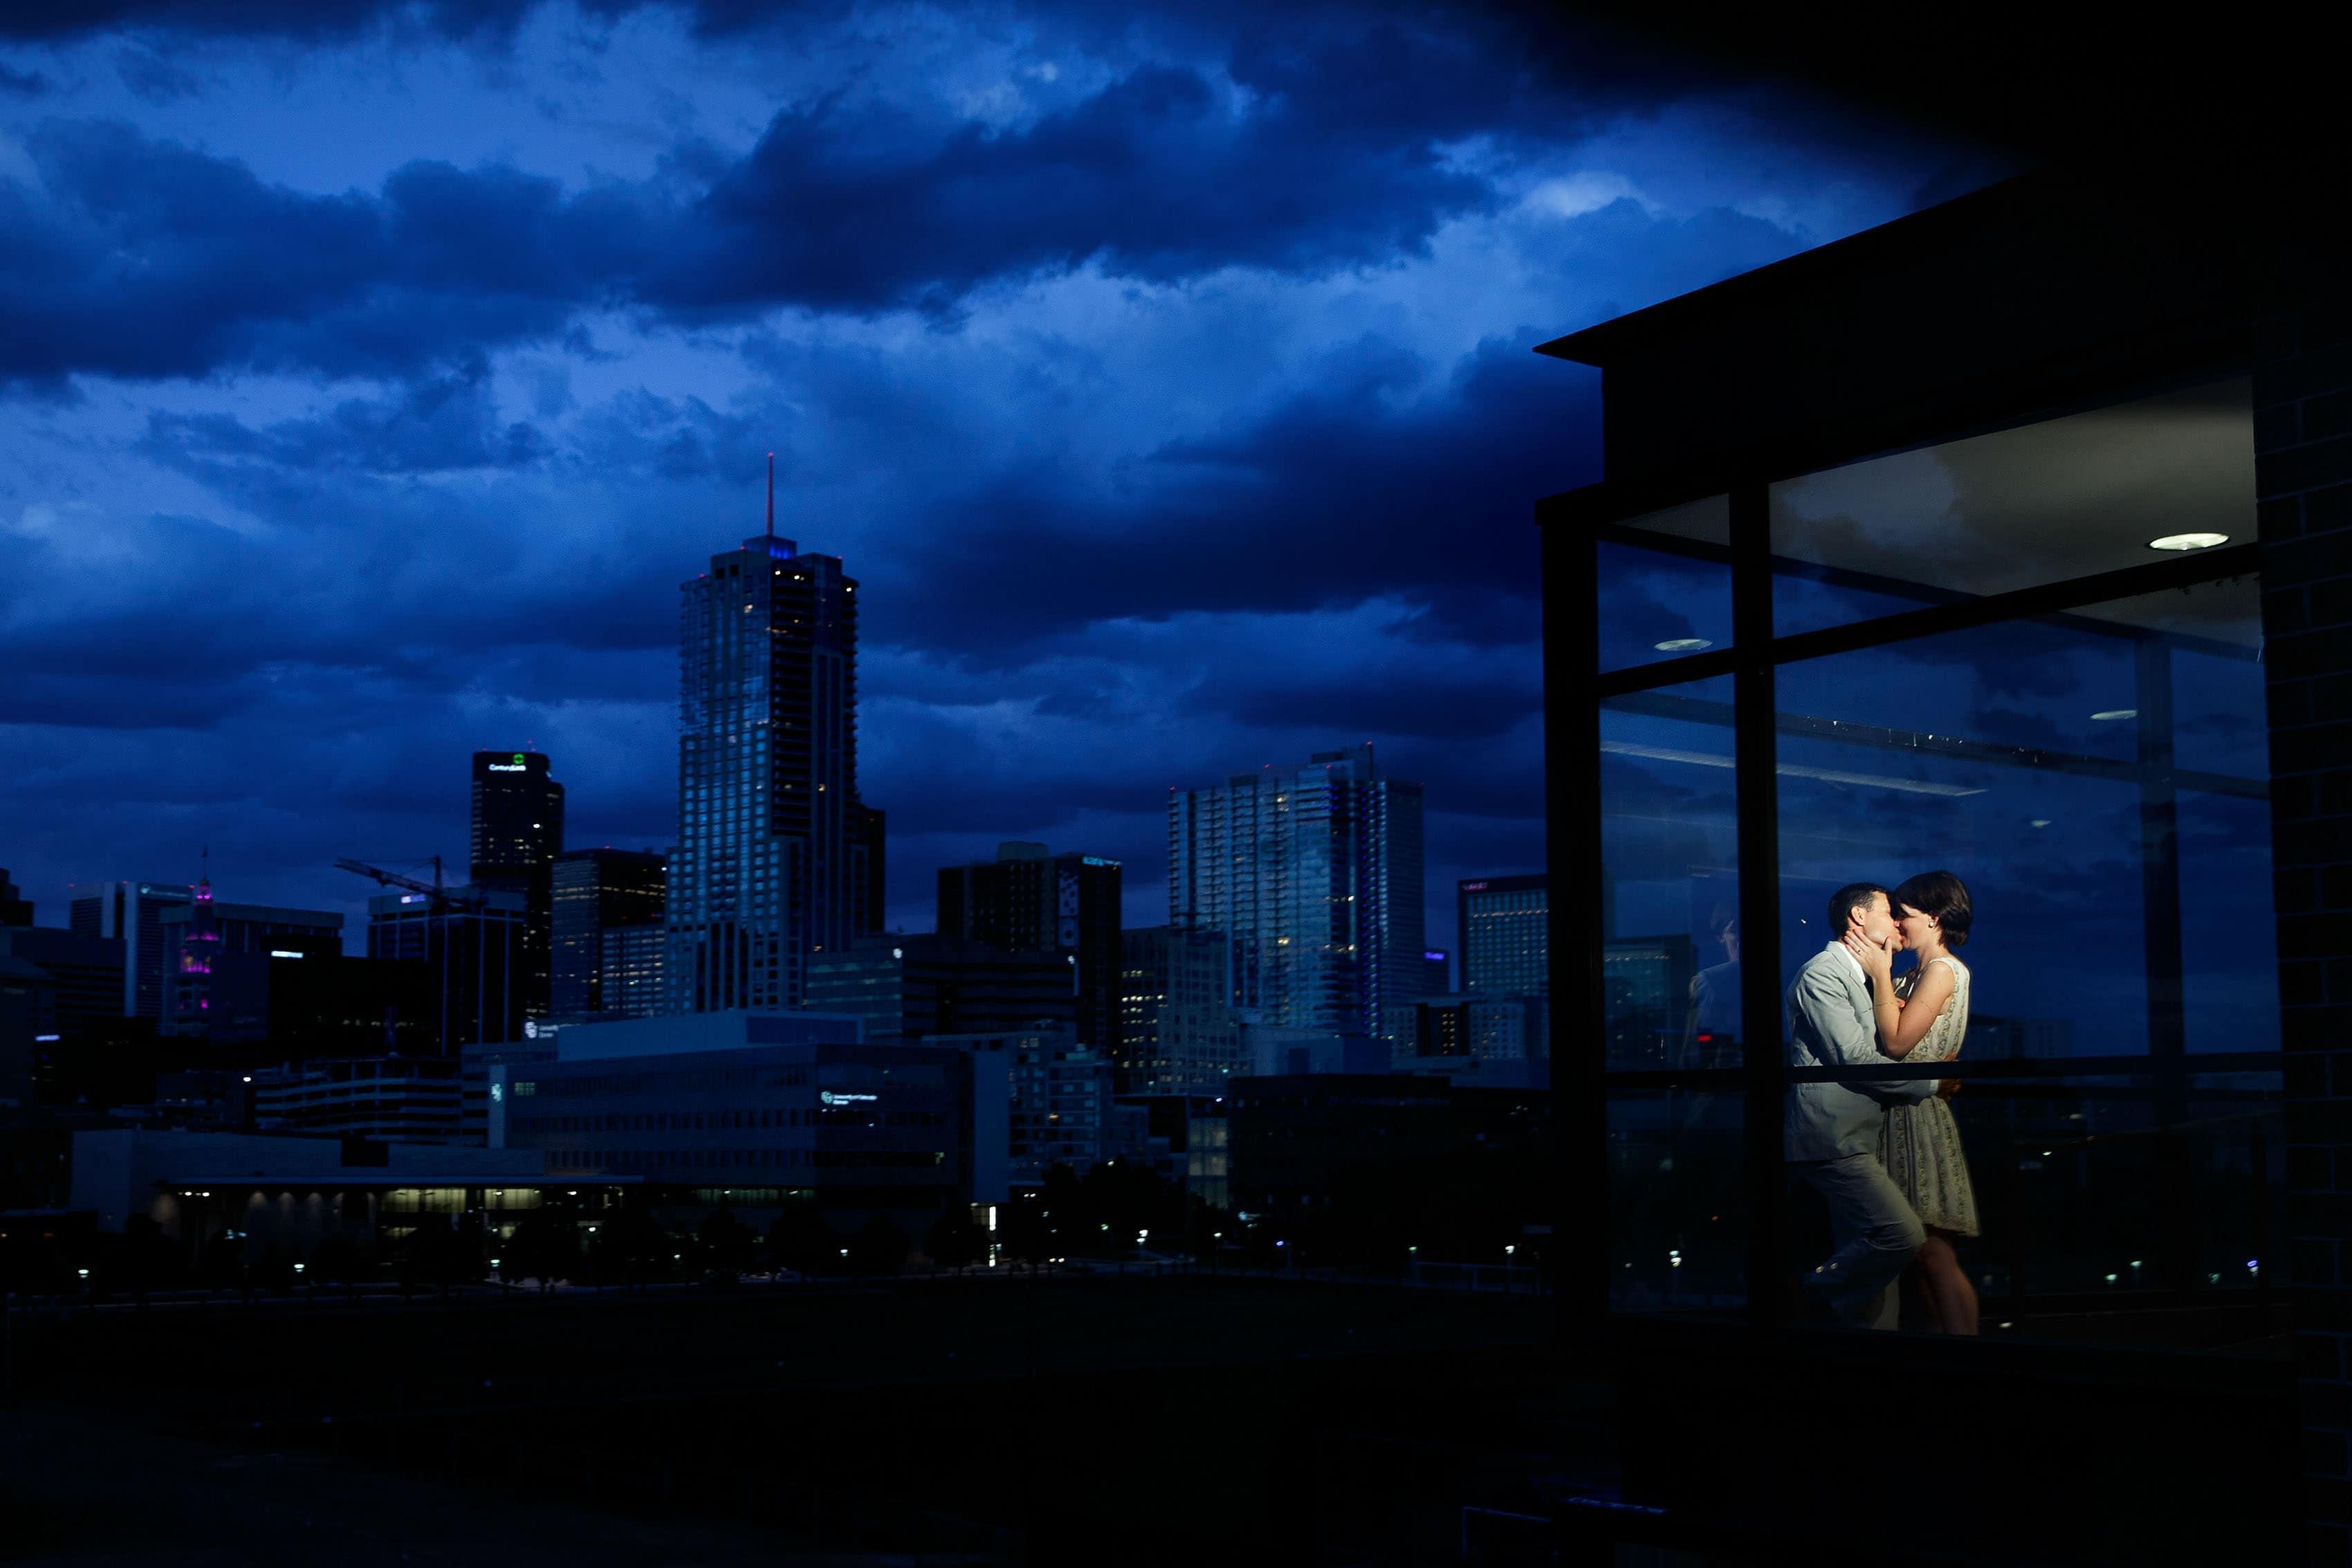 Engagement with Denver skyline on Auraria Campus